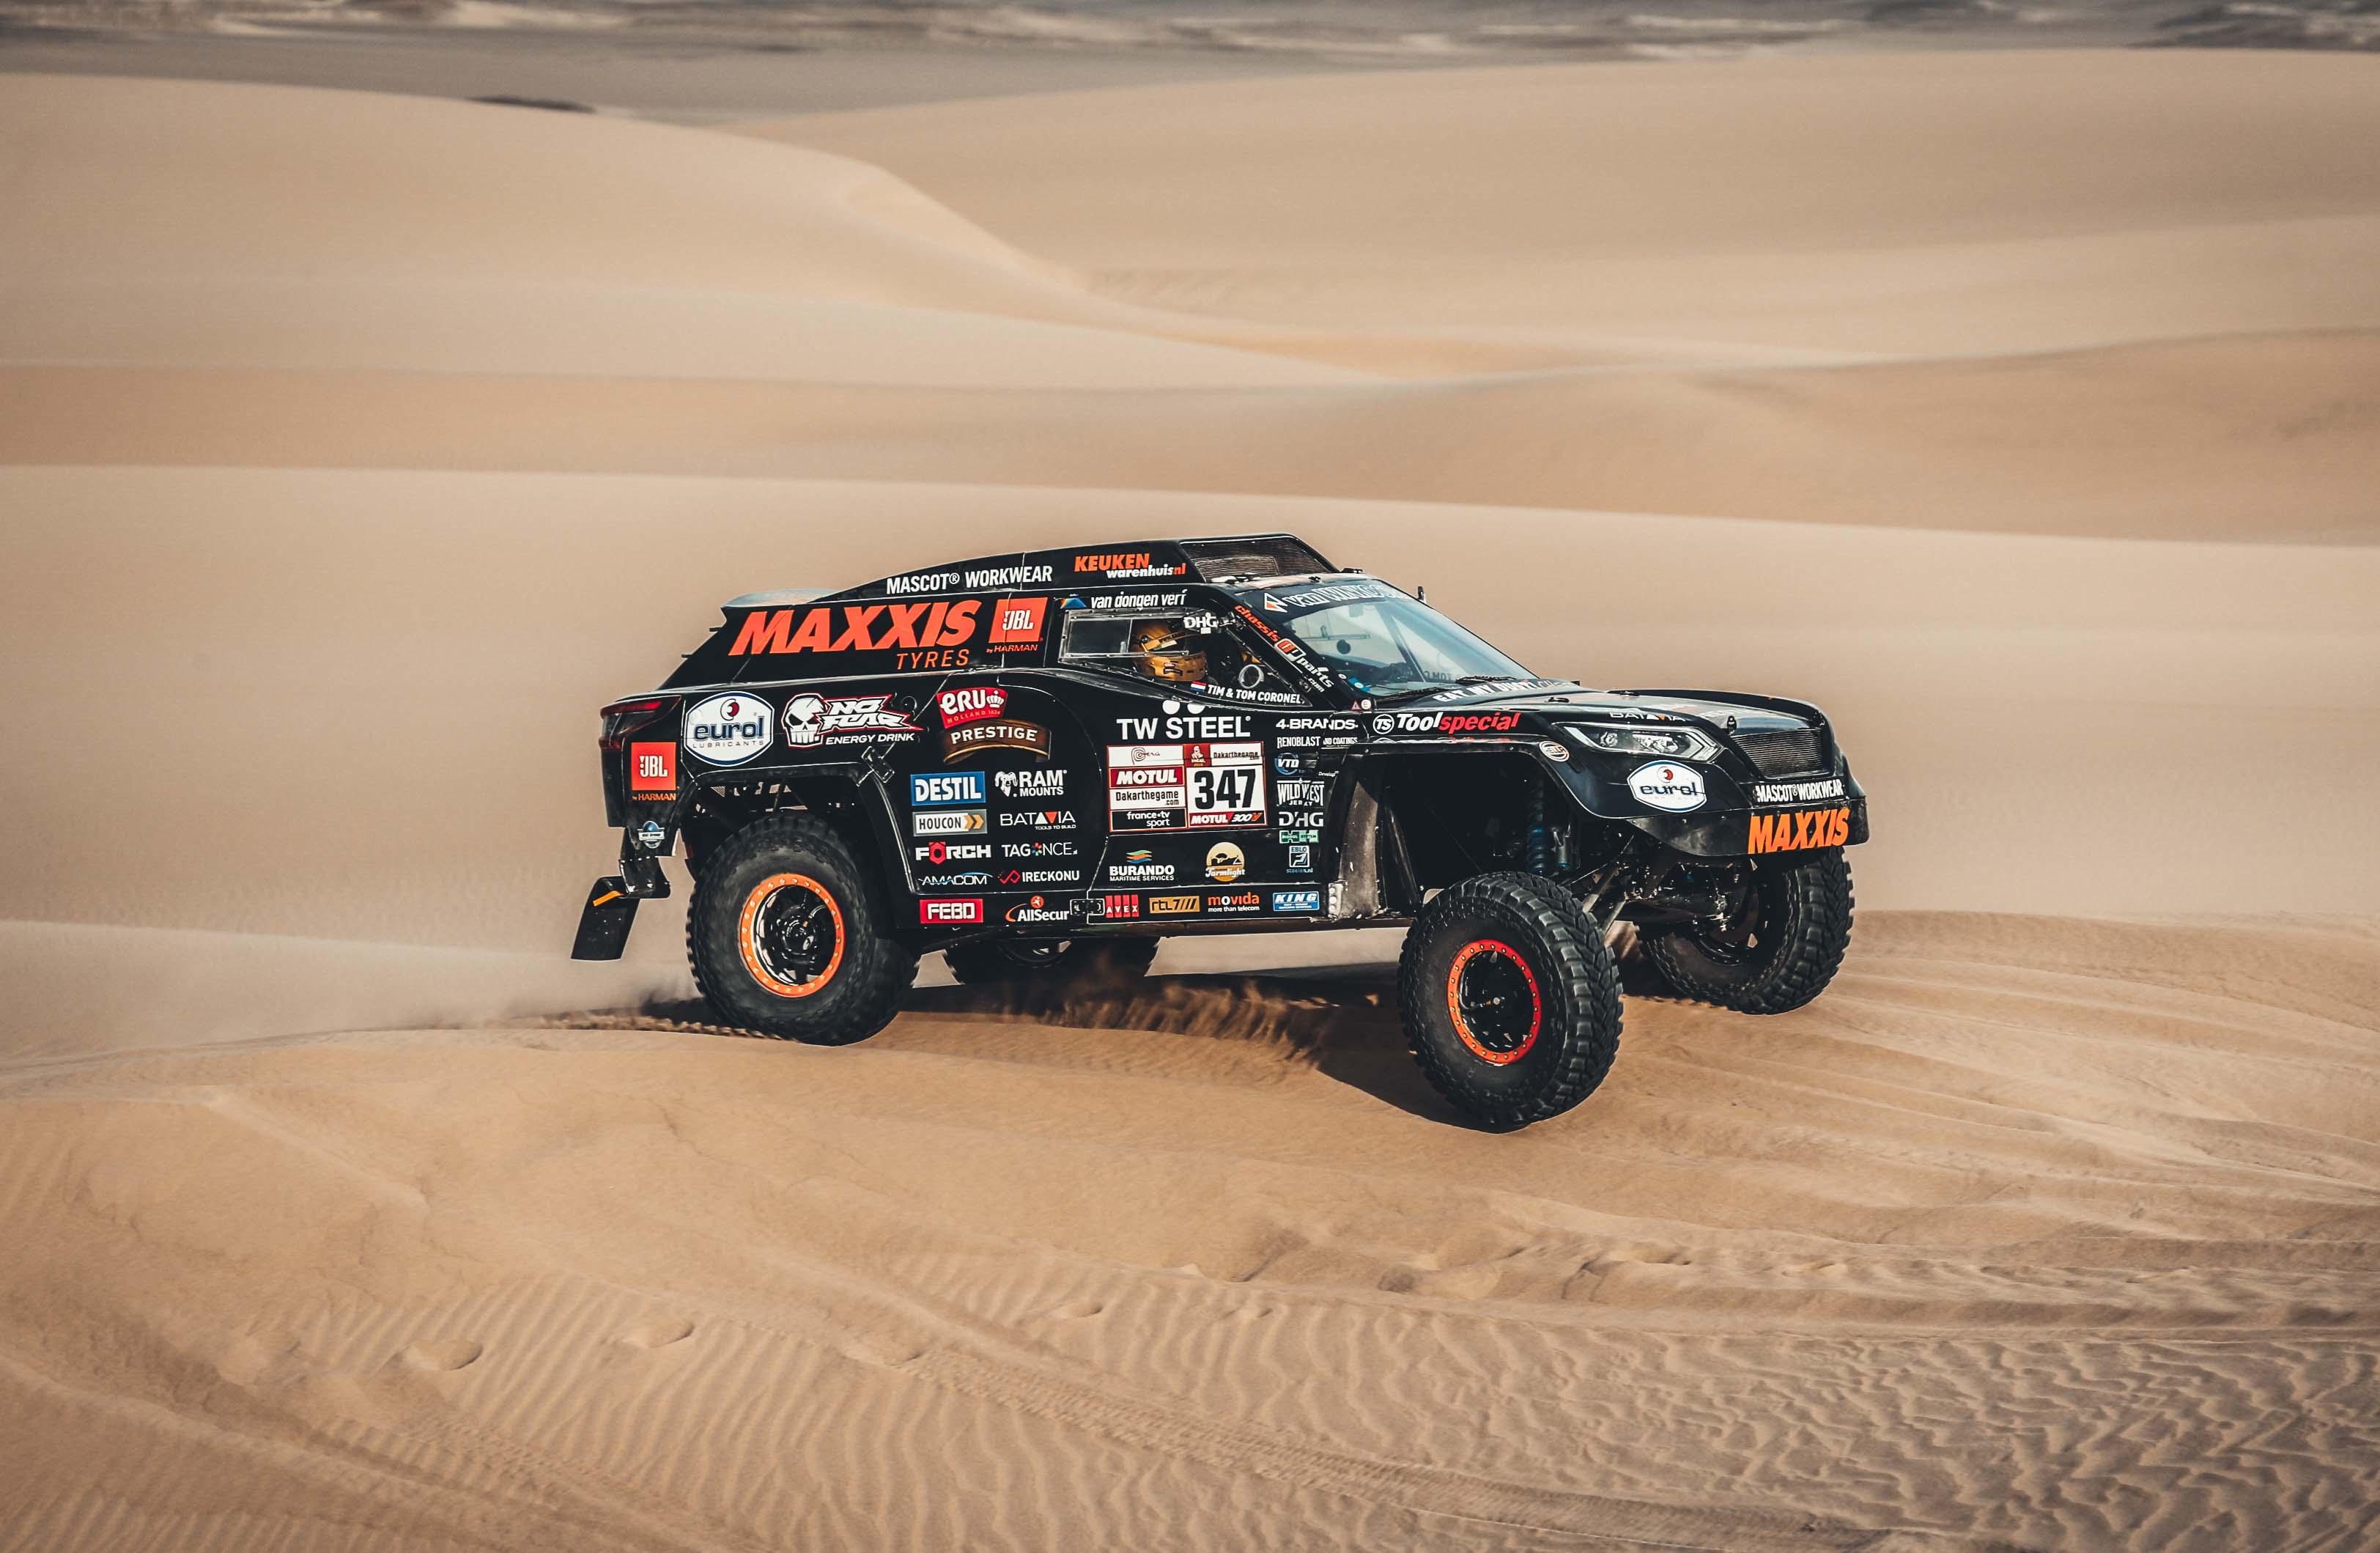 Dakar 2019 etappe 3 - Worstel en kom boven - editie 2019